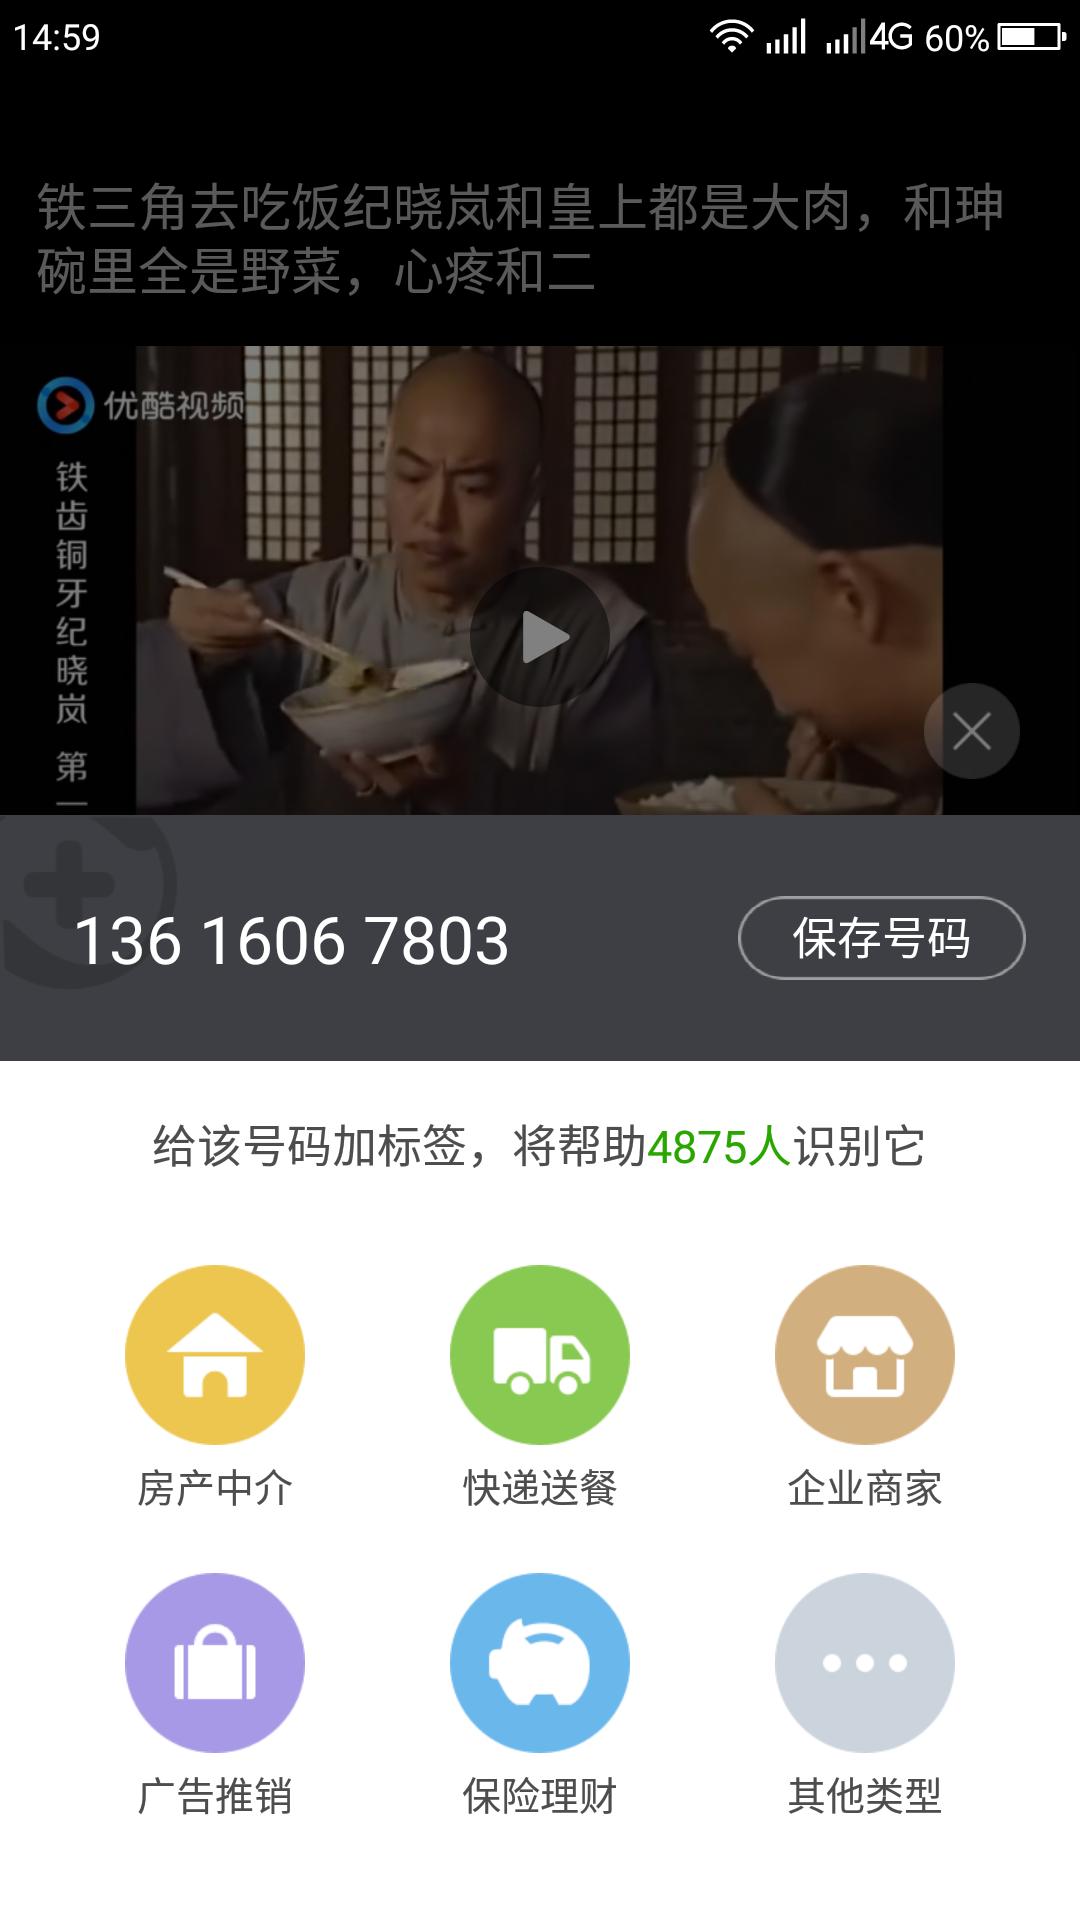 Screenshot_2019-05-15-14-59-03.png